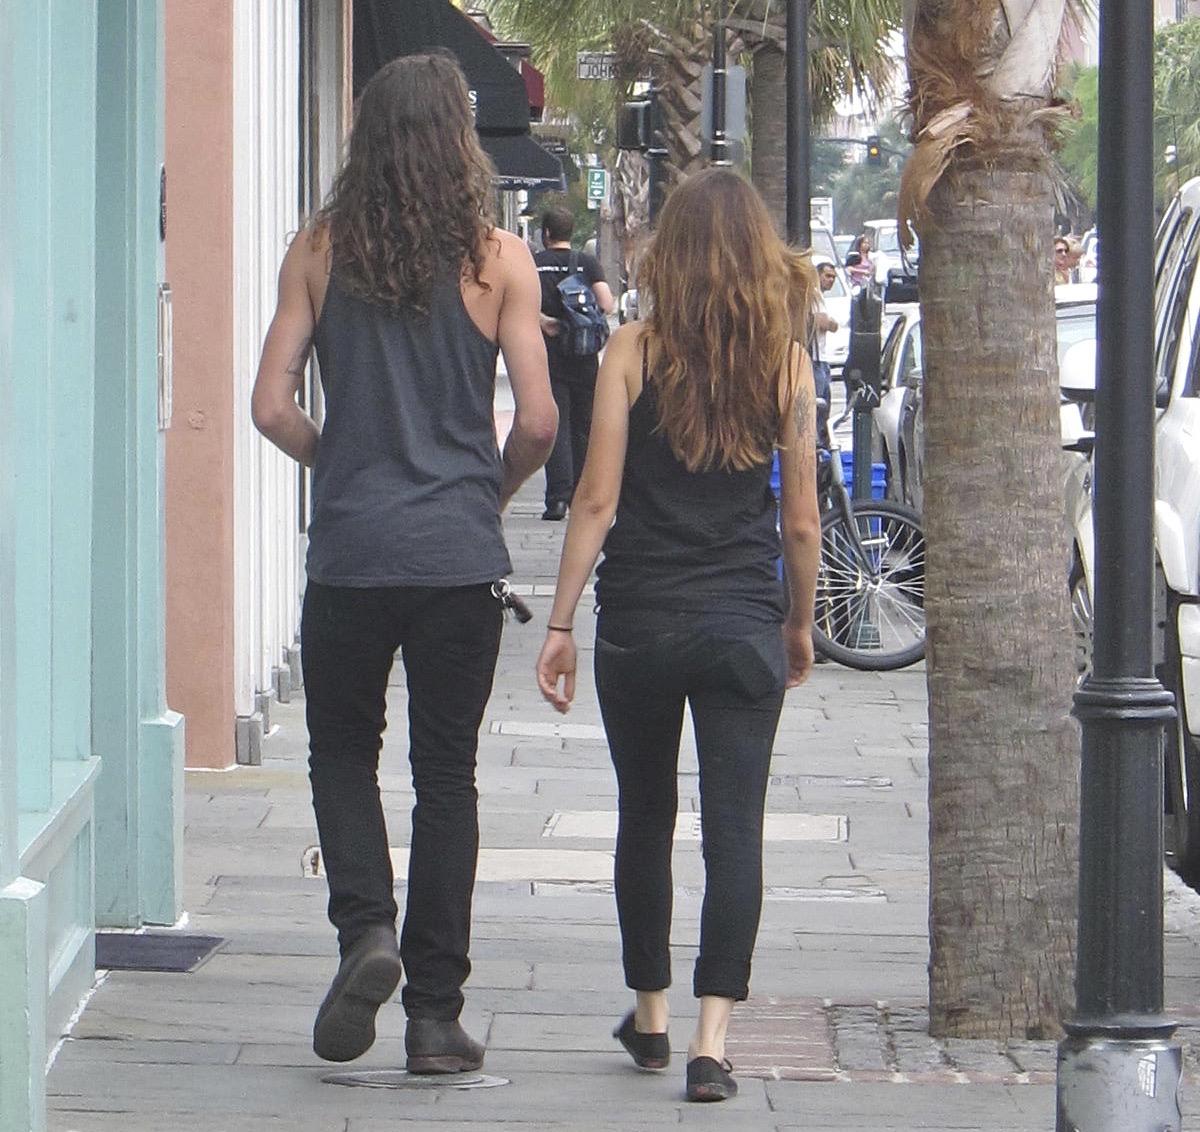 Look-Alike Couple in Charleston,SC